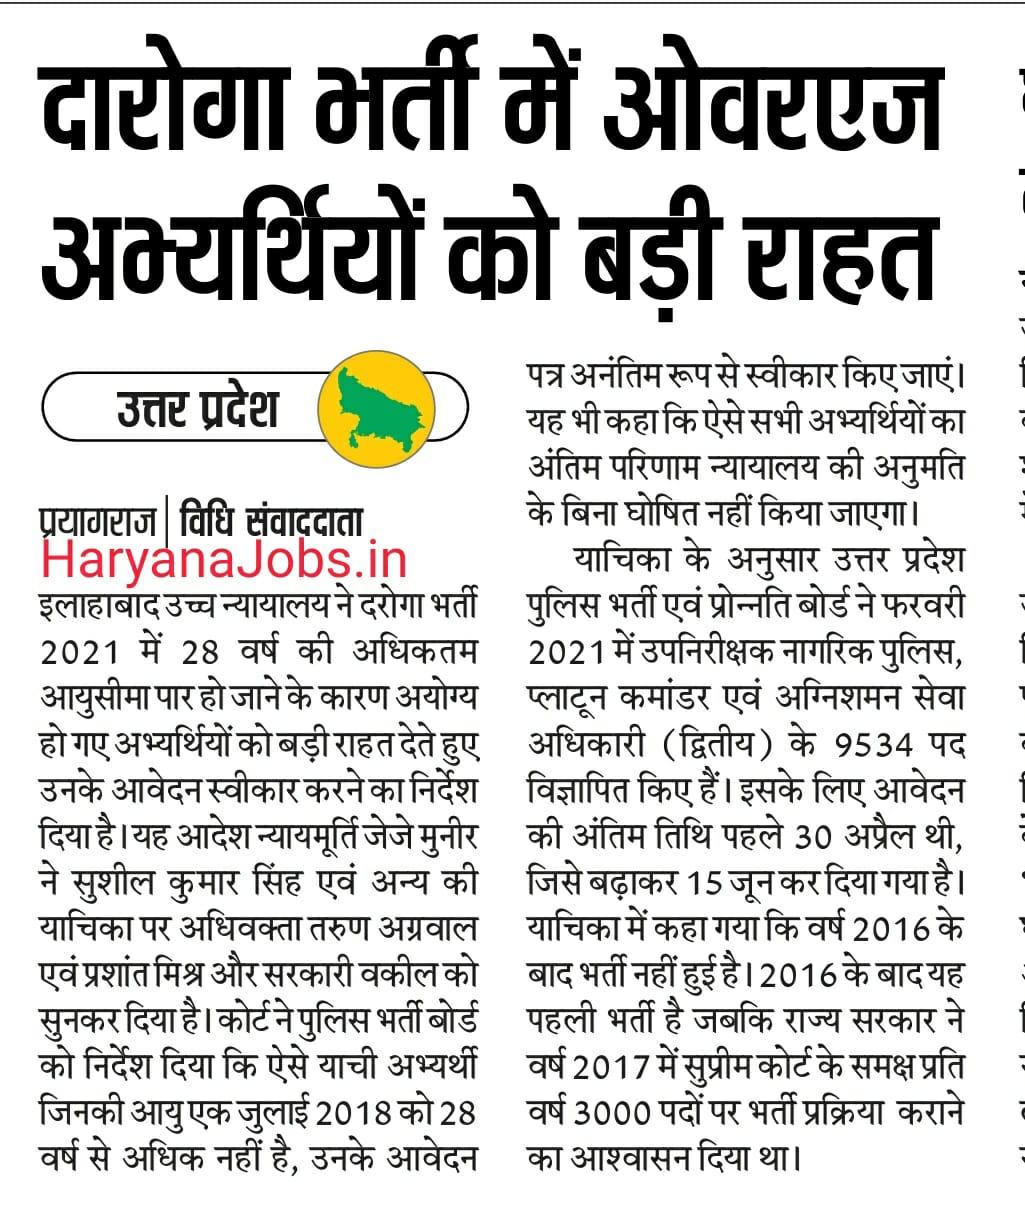 UP Daroga Bharti Age Relaxation News